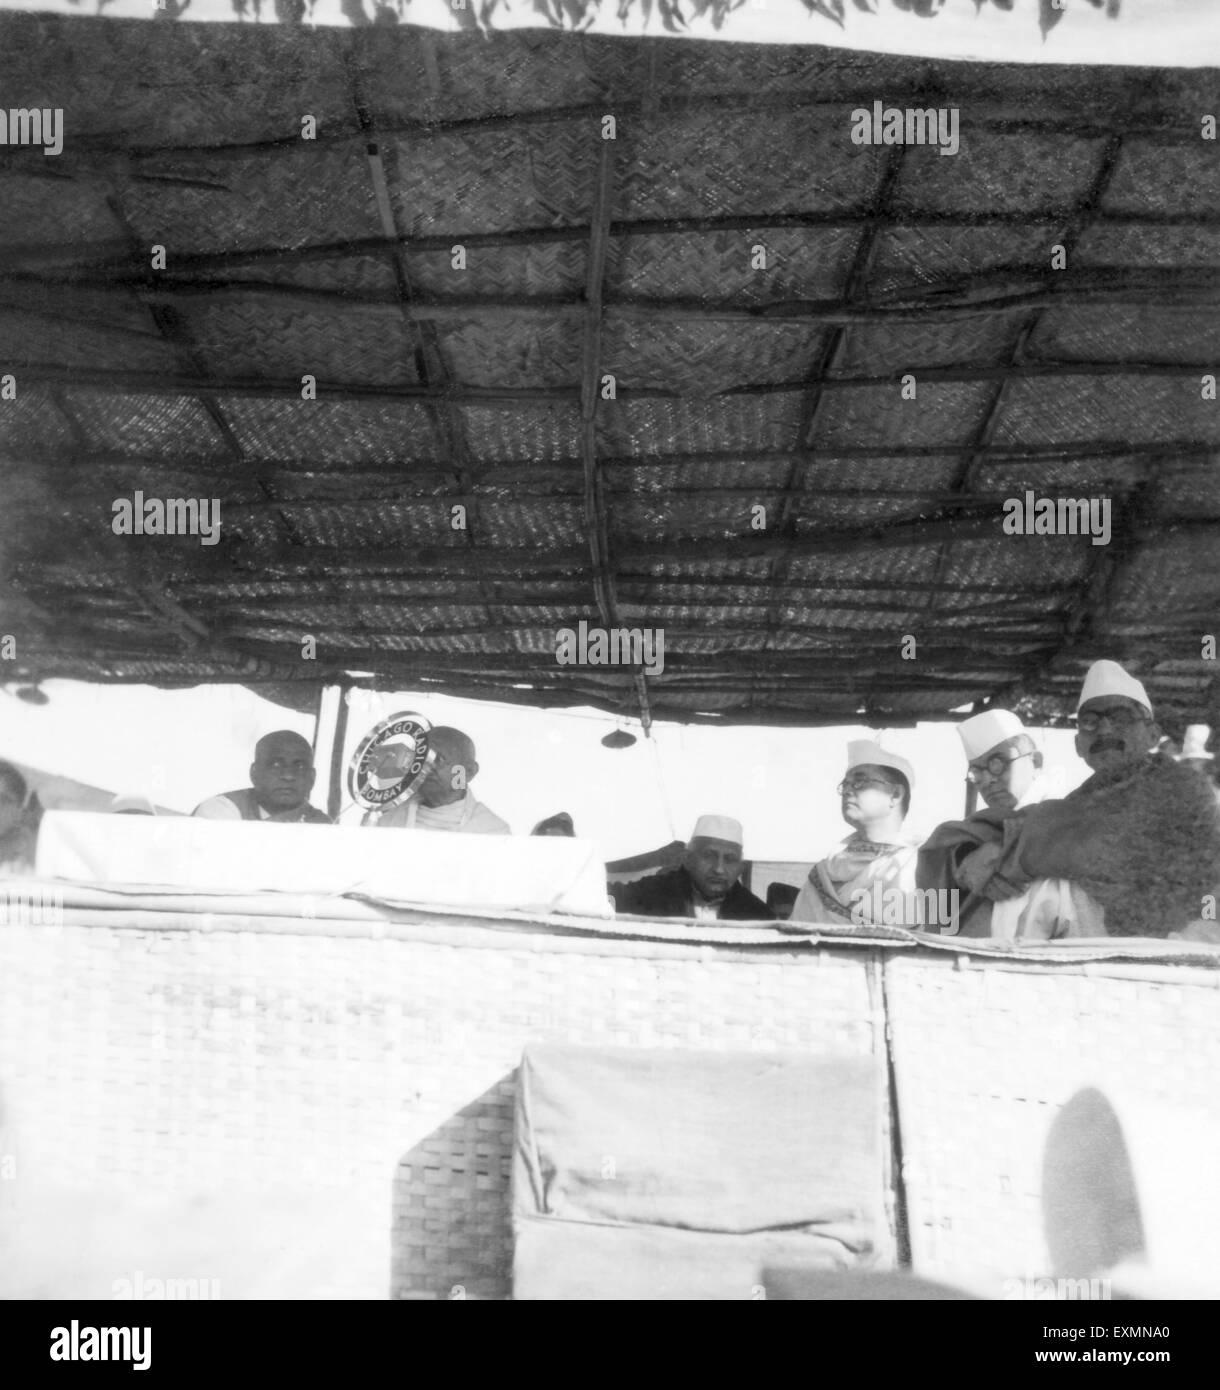 Sardar Vallabhbhai Patel ; Mahatma Gandhi ; Bhulabhai Desai ; Subhash Chandra Bose and others dais public meeting - Stock Image